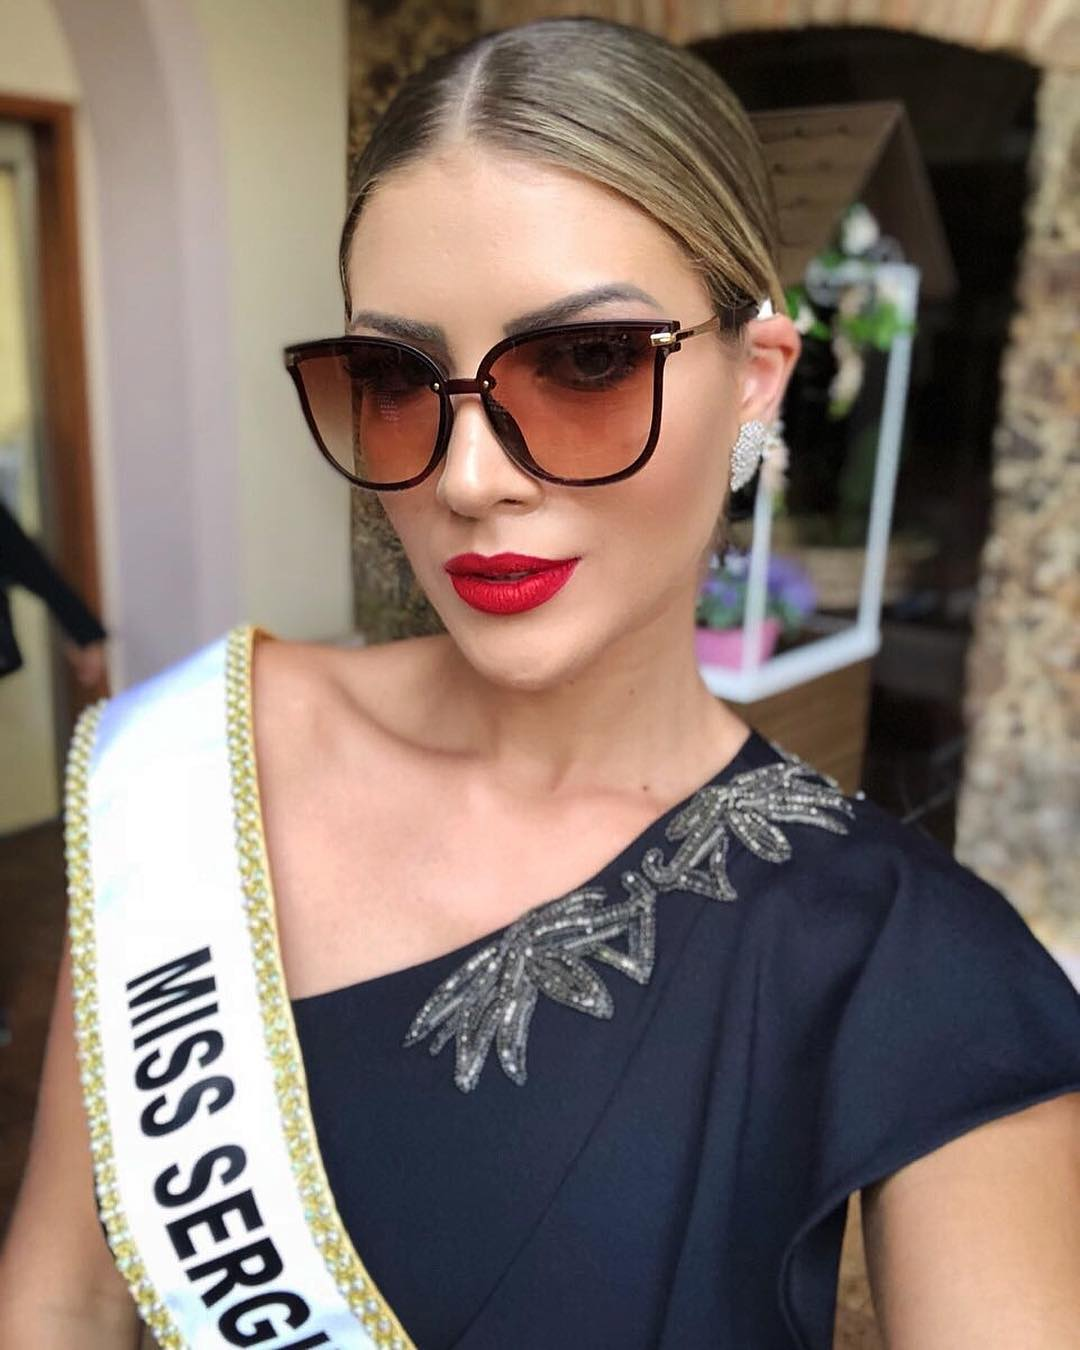 carol valenca, miss sergipe empresarial 2018/sergipe universo 2016. - Página 2 37773510